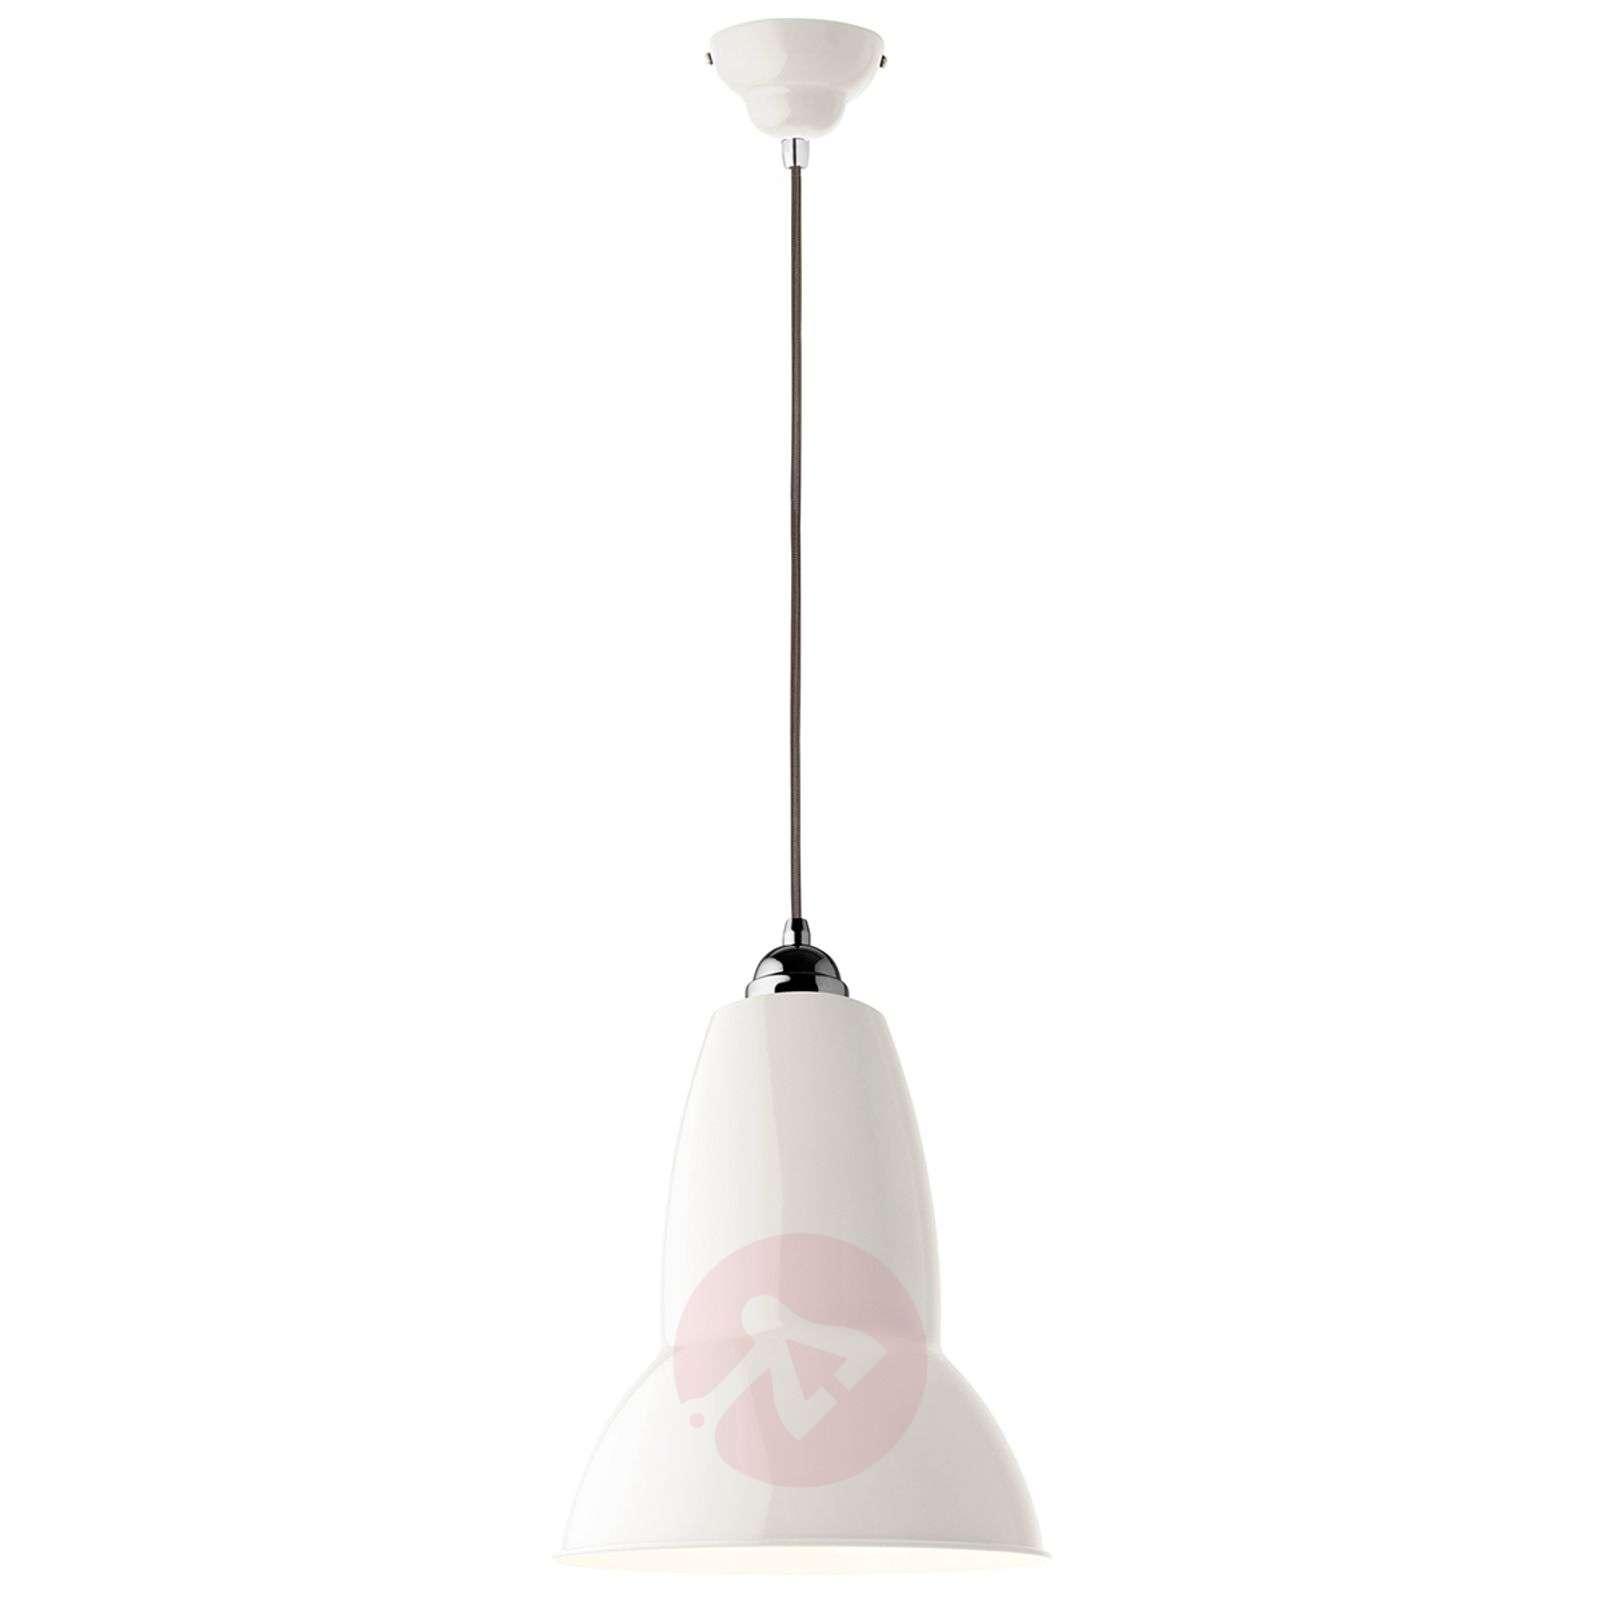 Anglepoise Original 1227 Maxi pendant lamp-1073084X-01